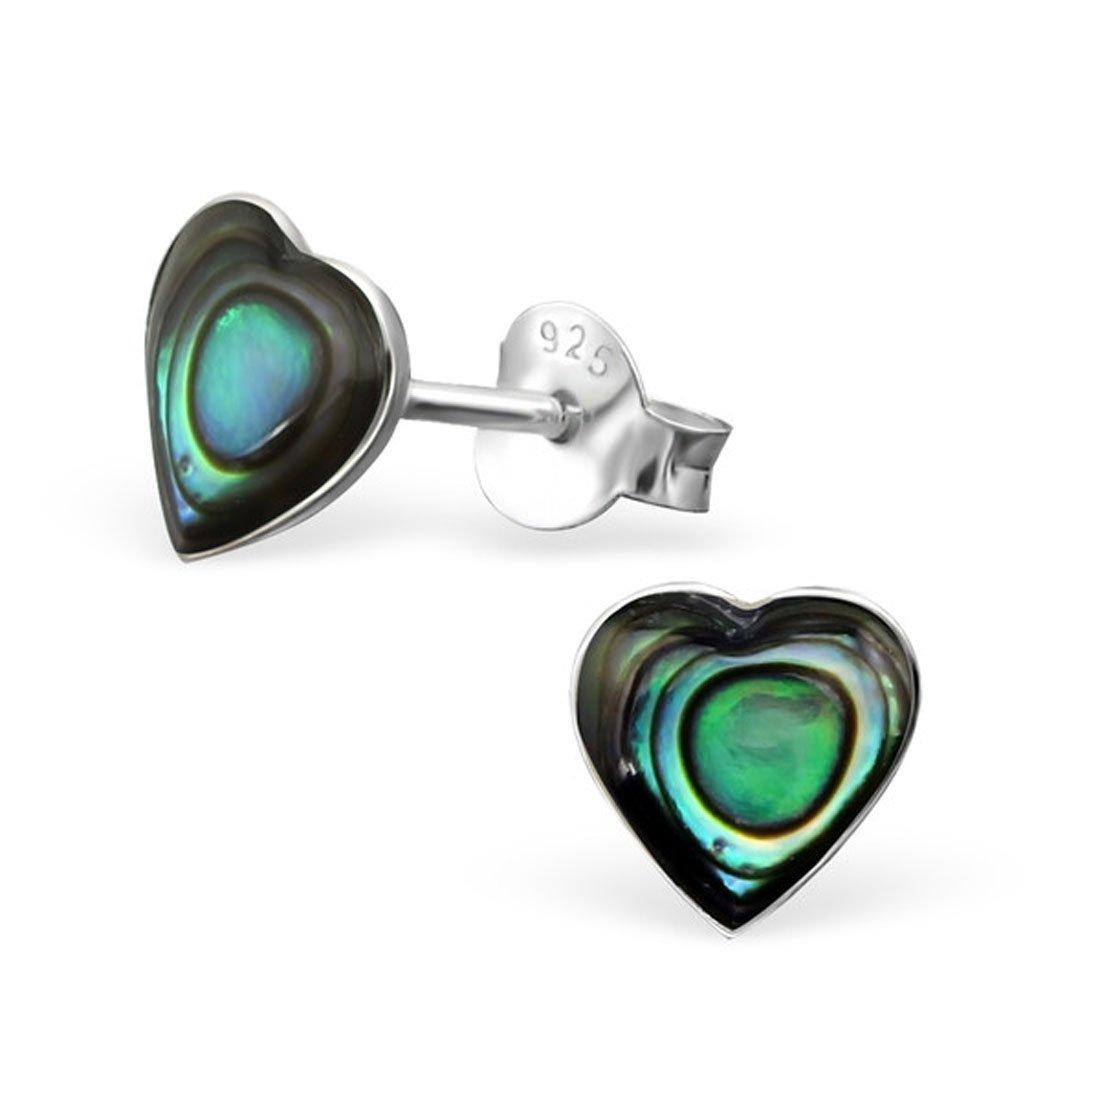 7mm Heart Shape Abalone Shell Stud Earrings Girls Sterling Silver 925 Nicke Free (E16548) (Abalone)